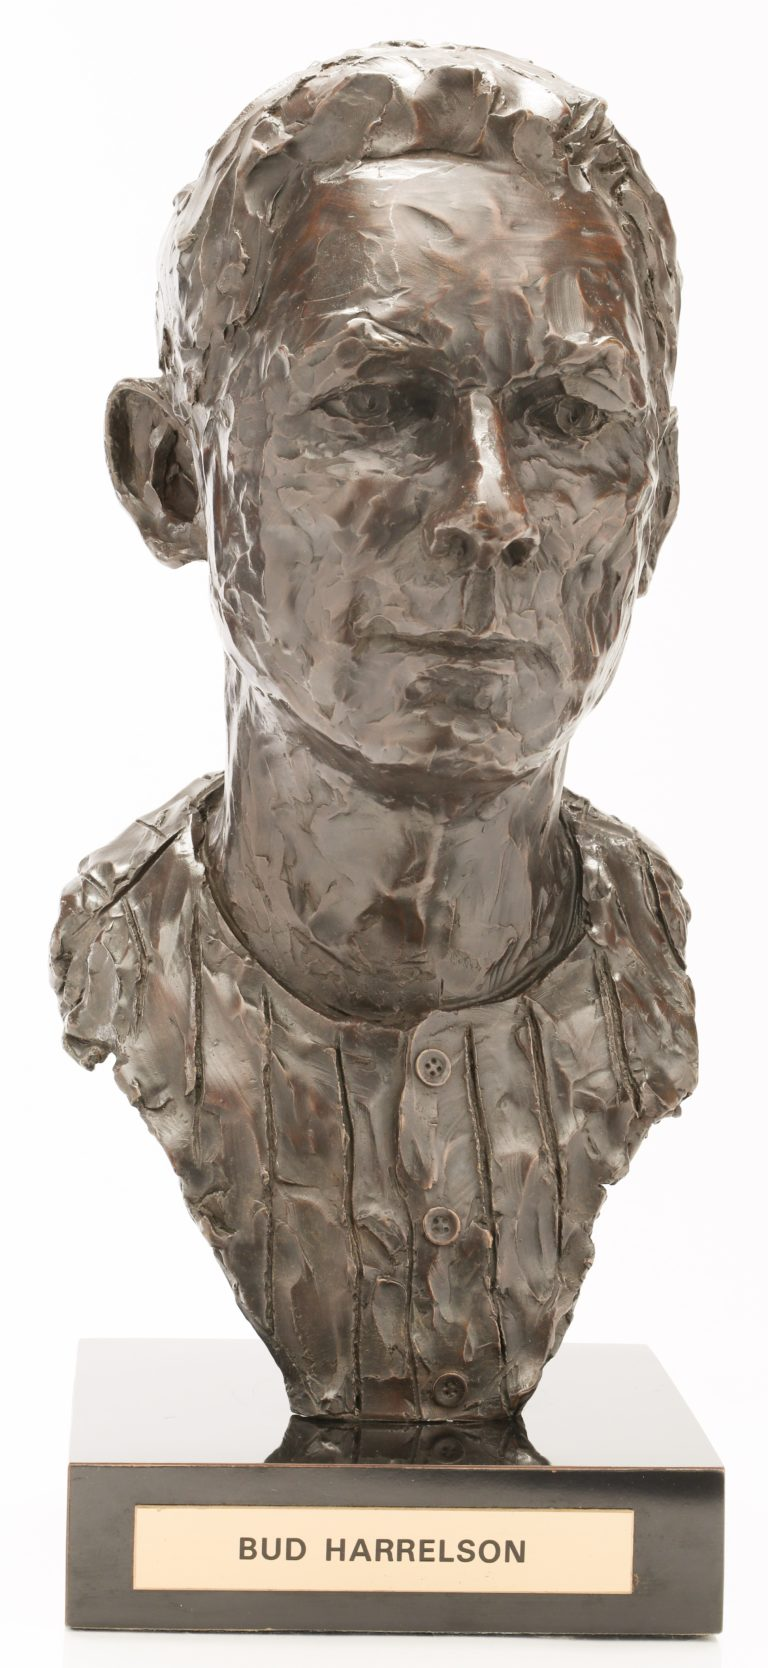 Bud Harrelson Bronze Bust Statue